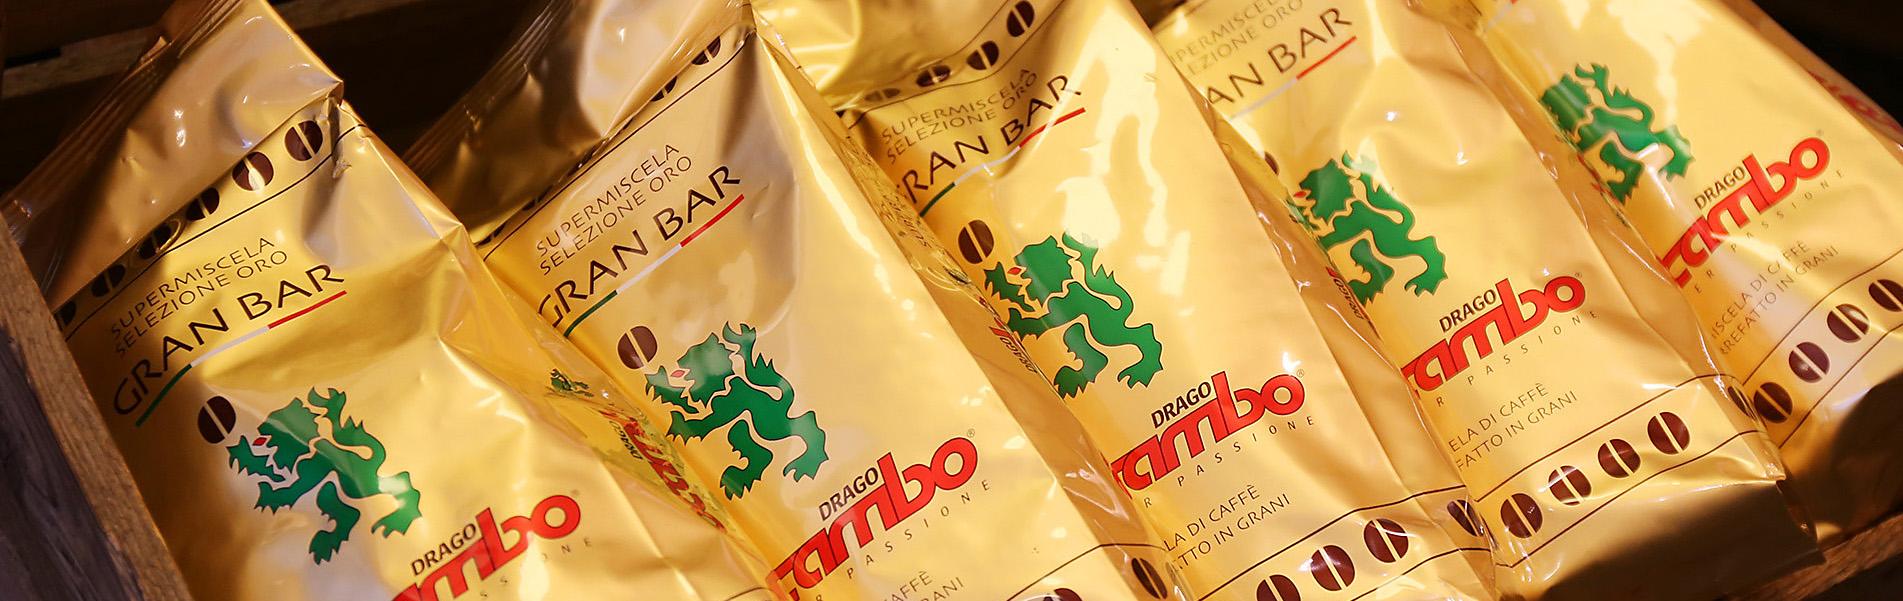 Unser Caffé der Woche: Mocambo Gran Bar